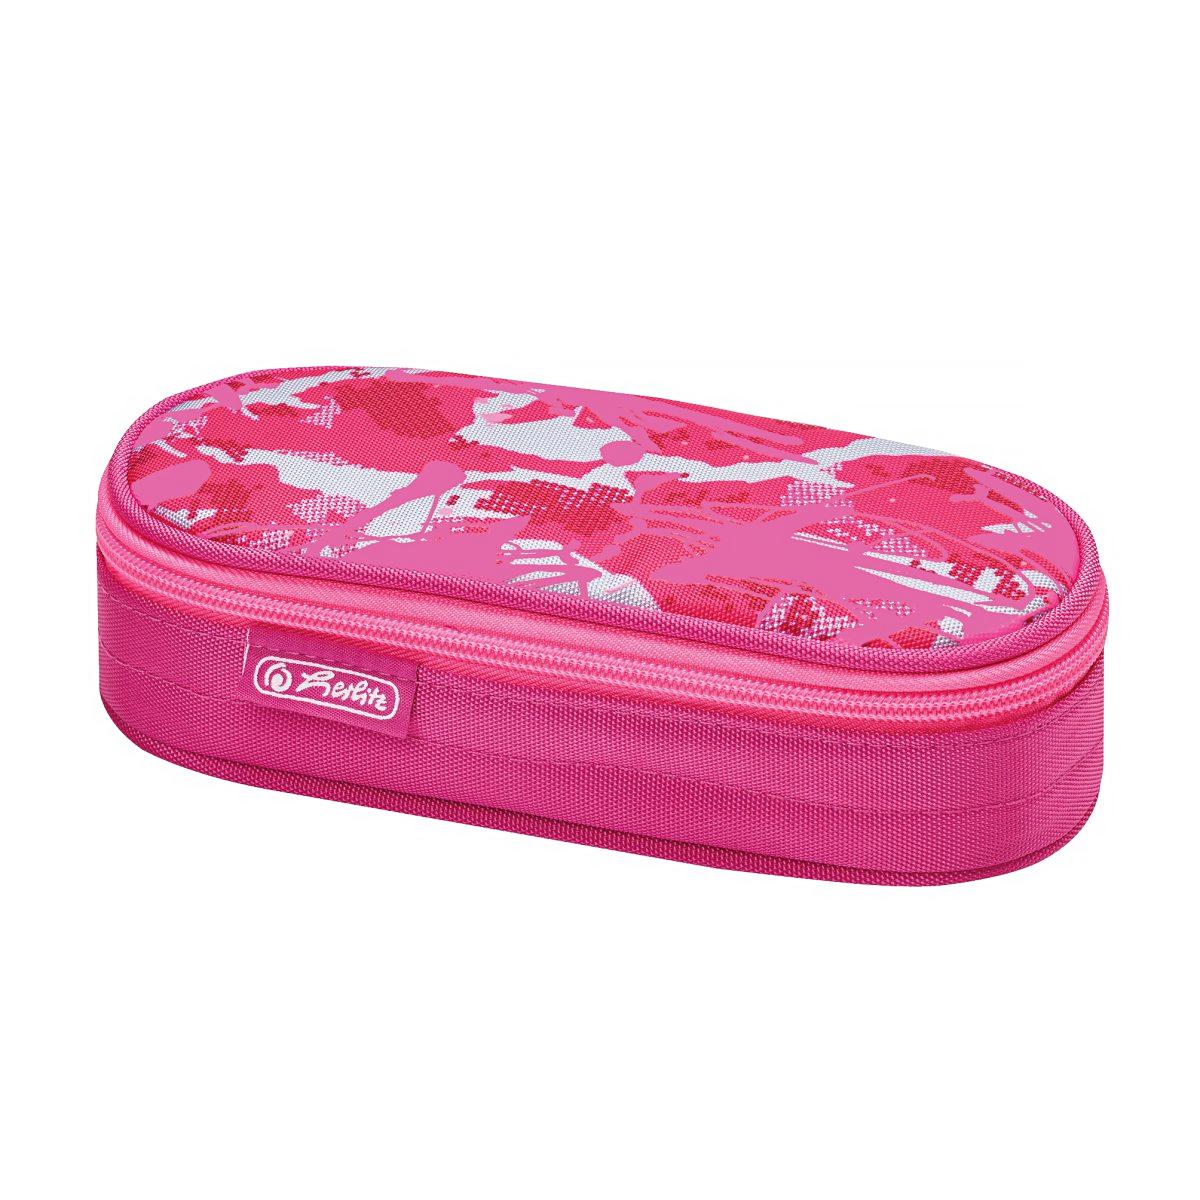 Necessaire Be.Bag Airgo, Camouflage Pink, Herlitz, 50015177